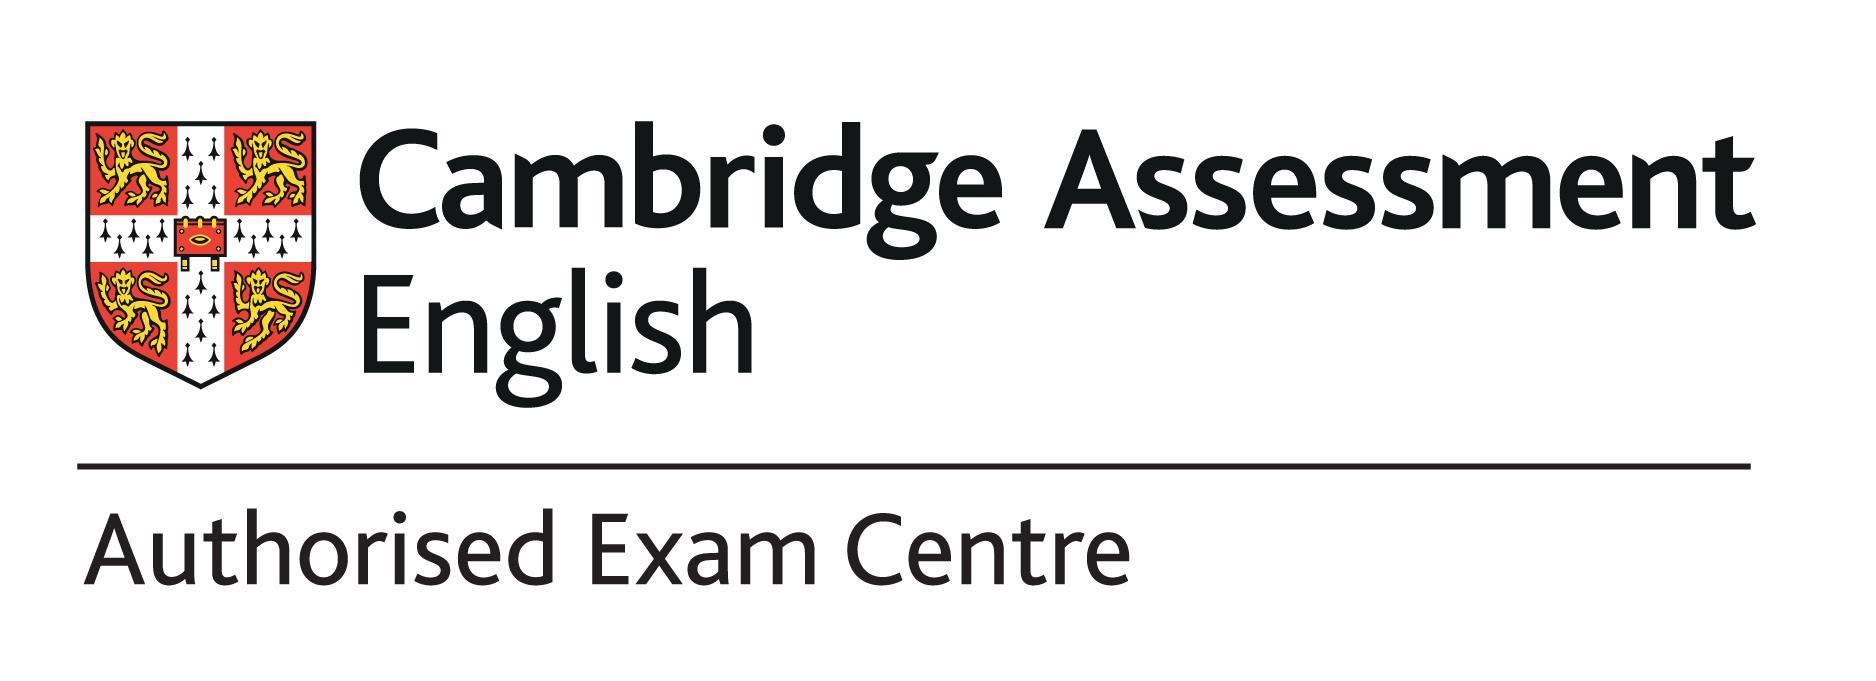 authorised_exam_centre_logo_rgb.jpg